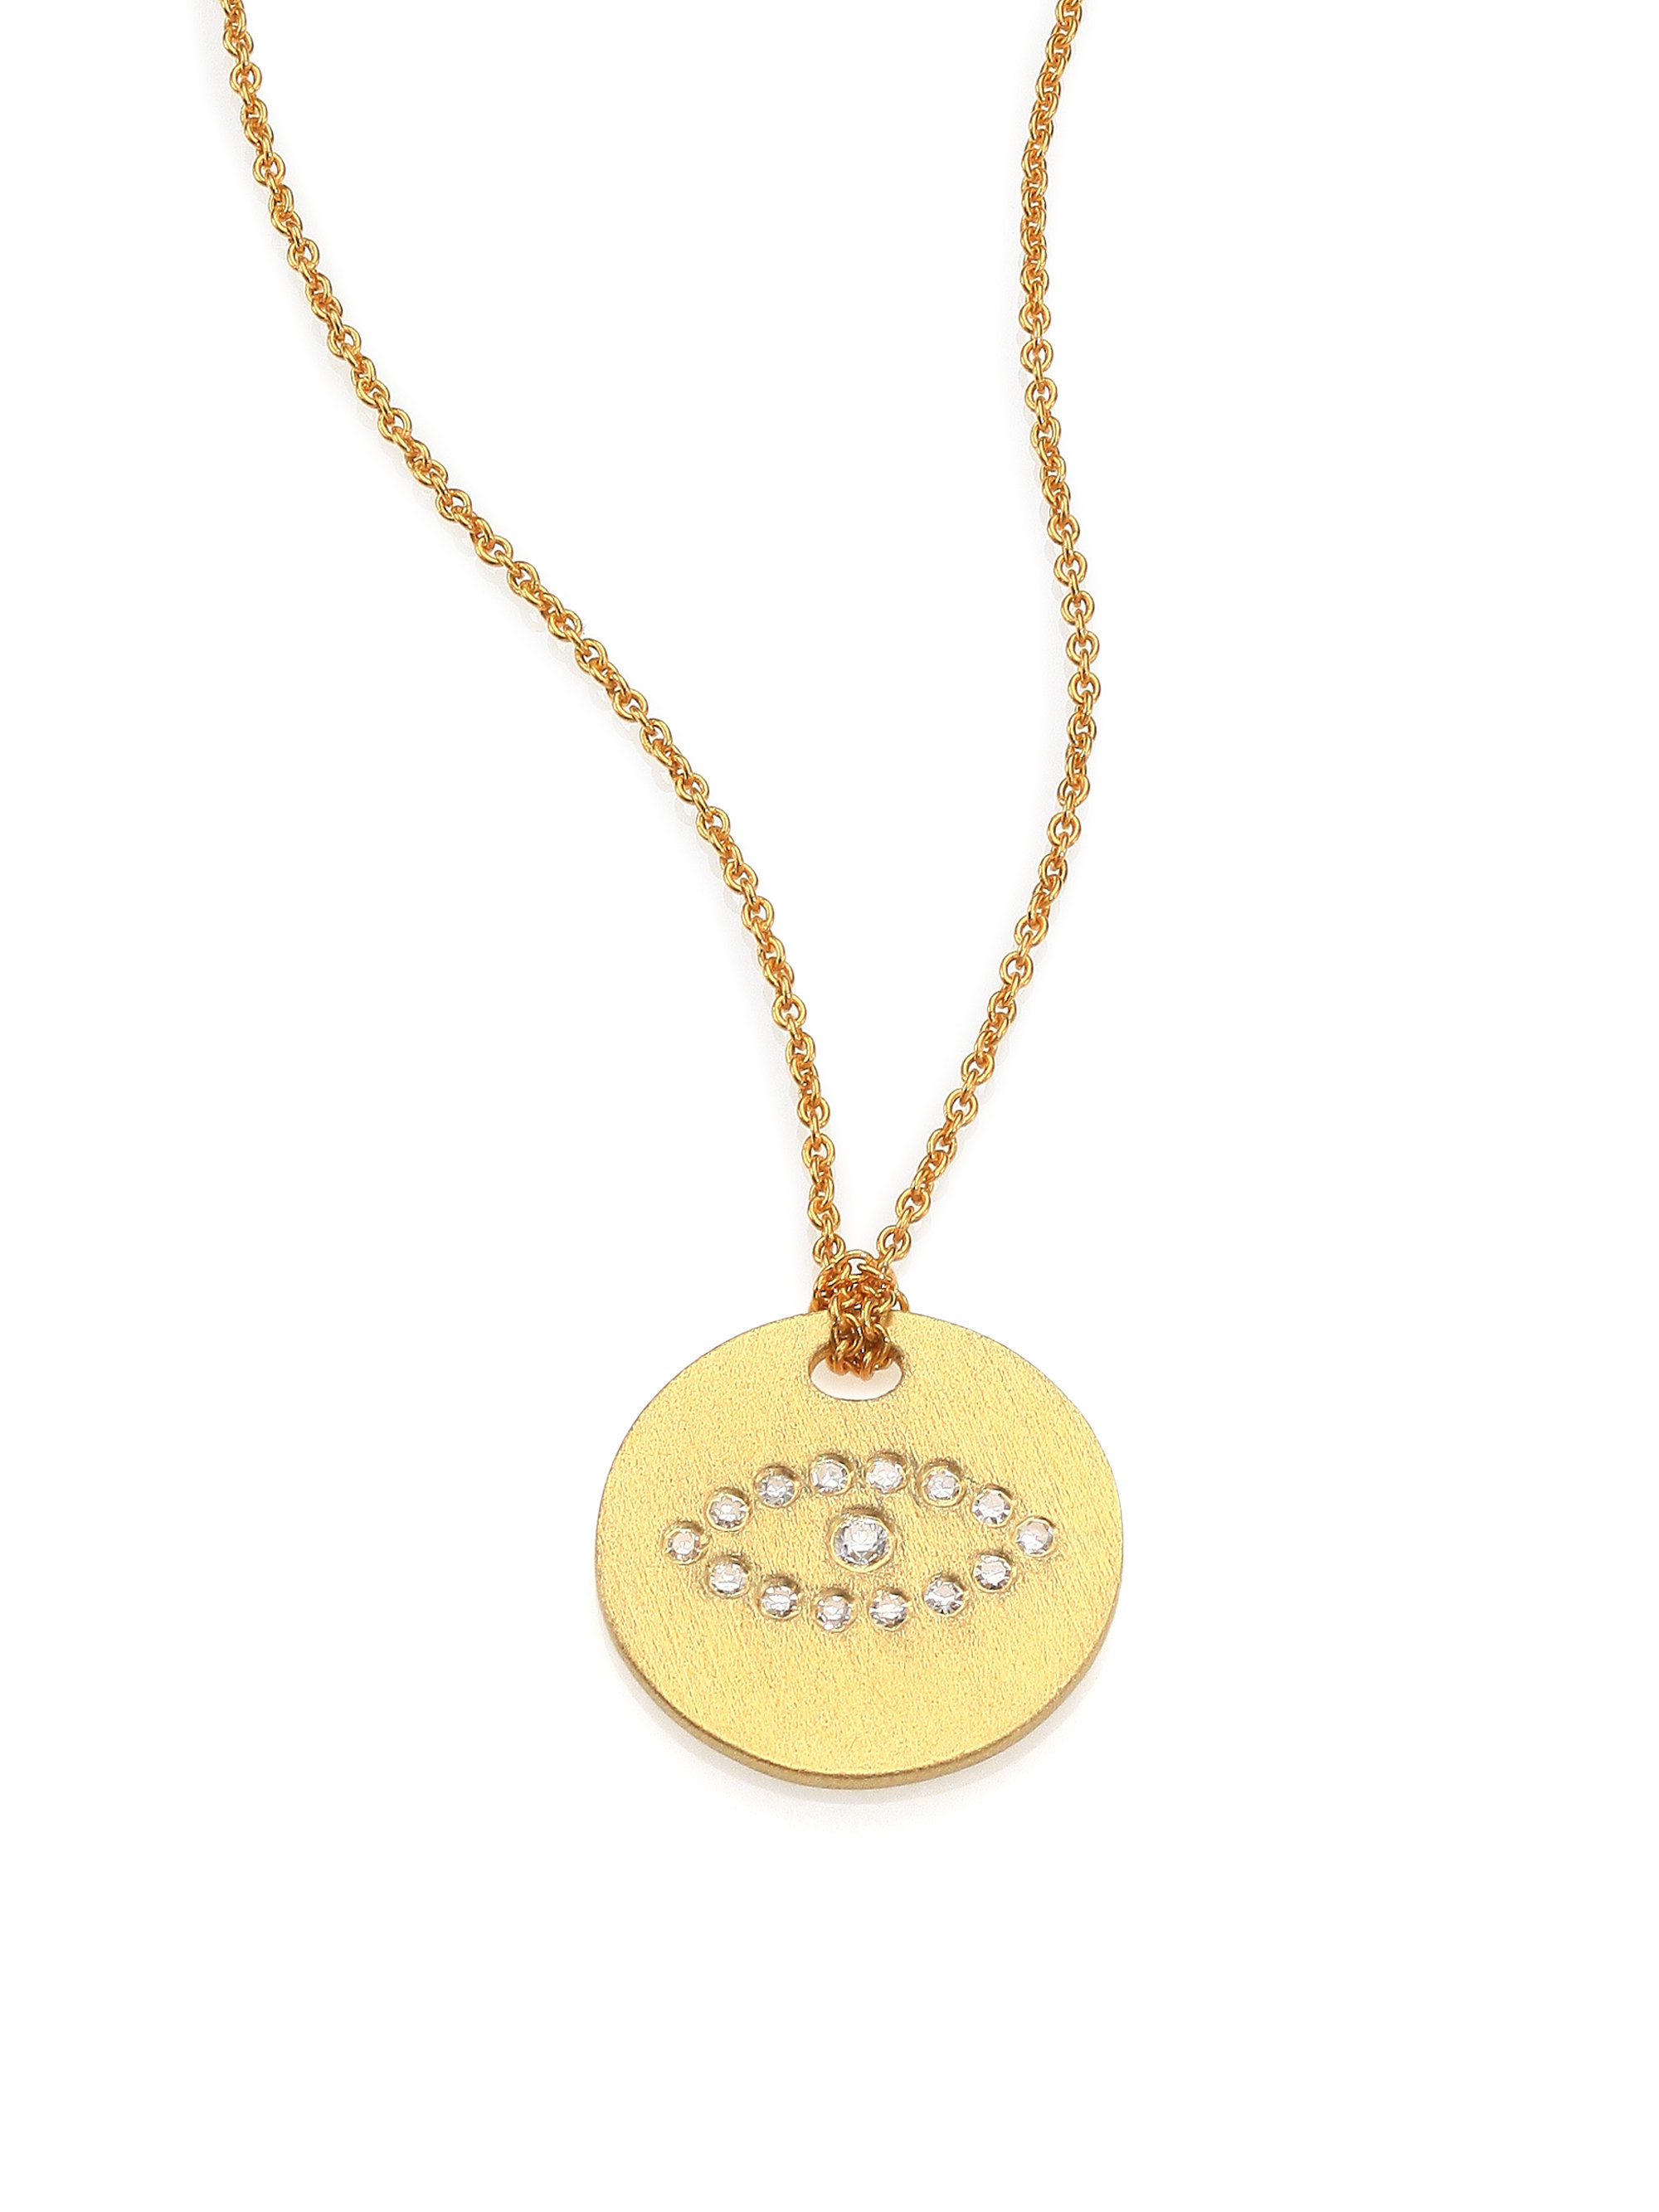 roberto coin tiny treasures 18k yellow gold evil